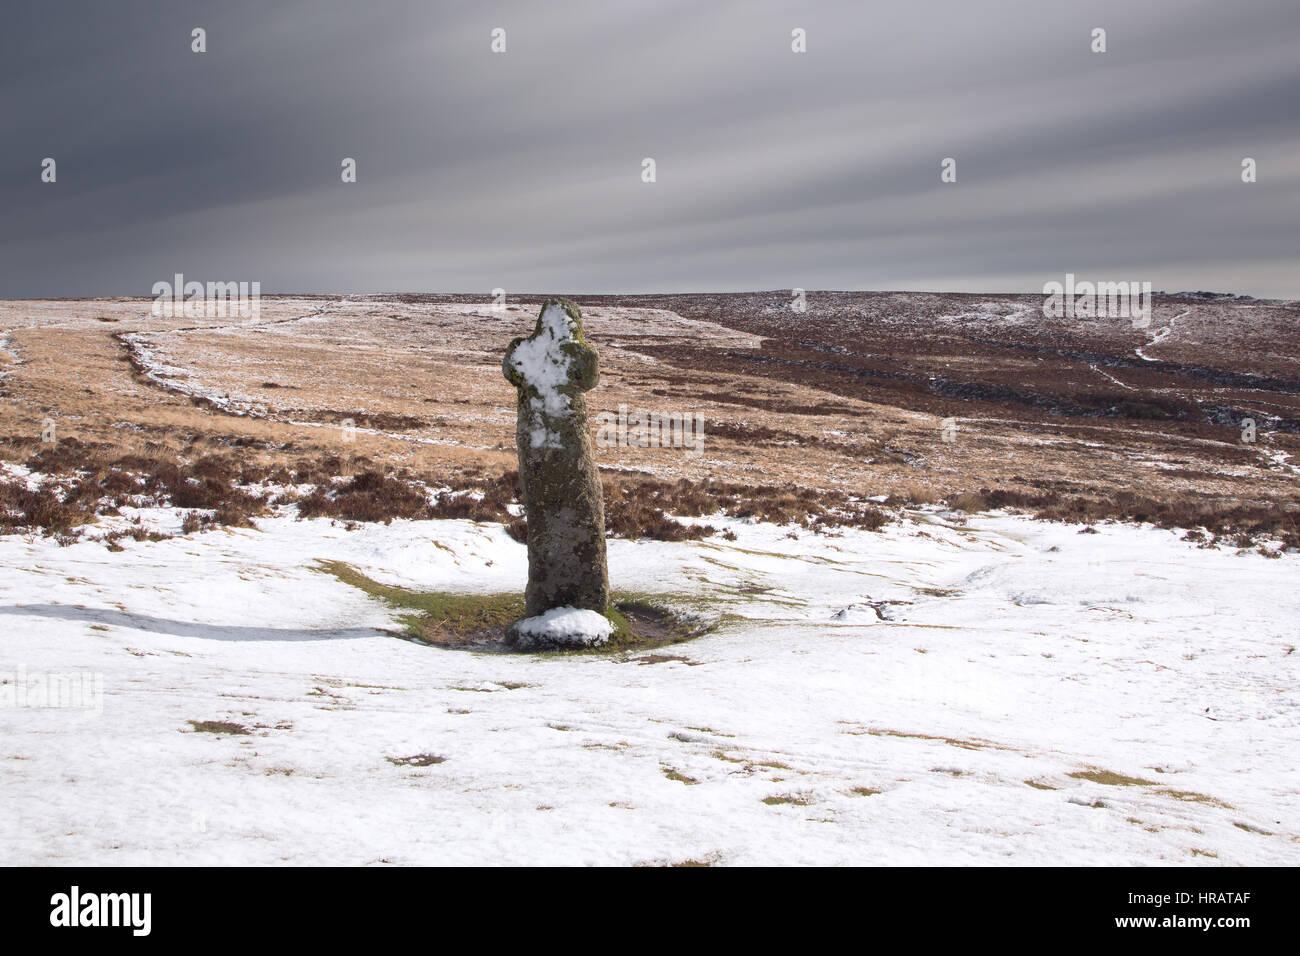 Dartmoor, Devon, UK. 28th Feb, 2017. UK Weather. A light dusting of snow fell on Dartmoor, Devon Credit: Anna Curnow/Alamy - Stock Image